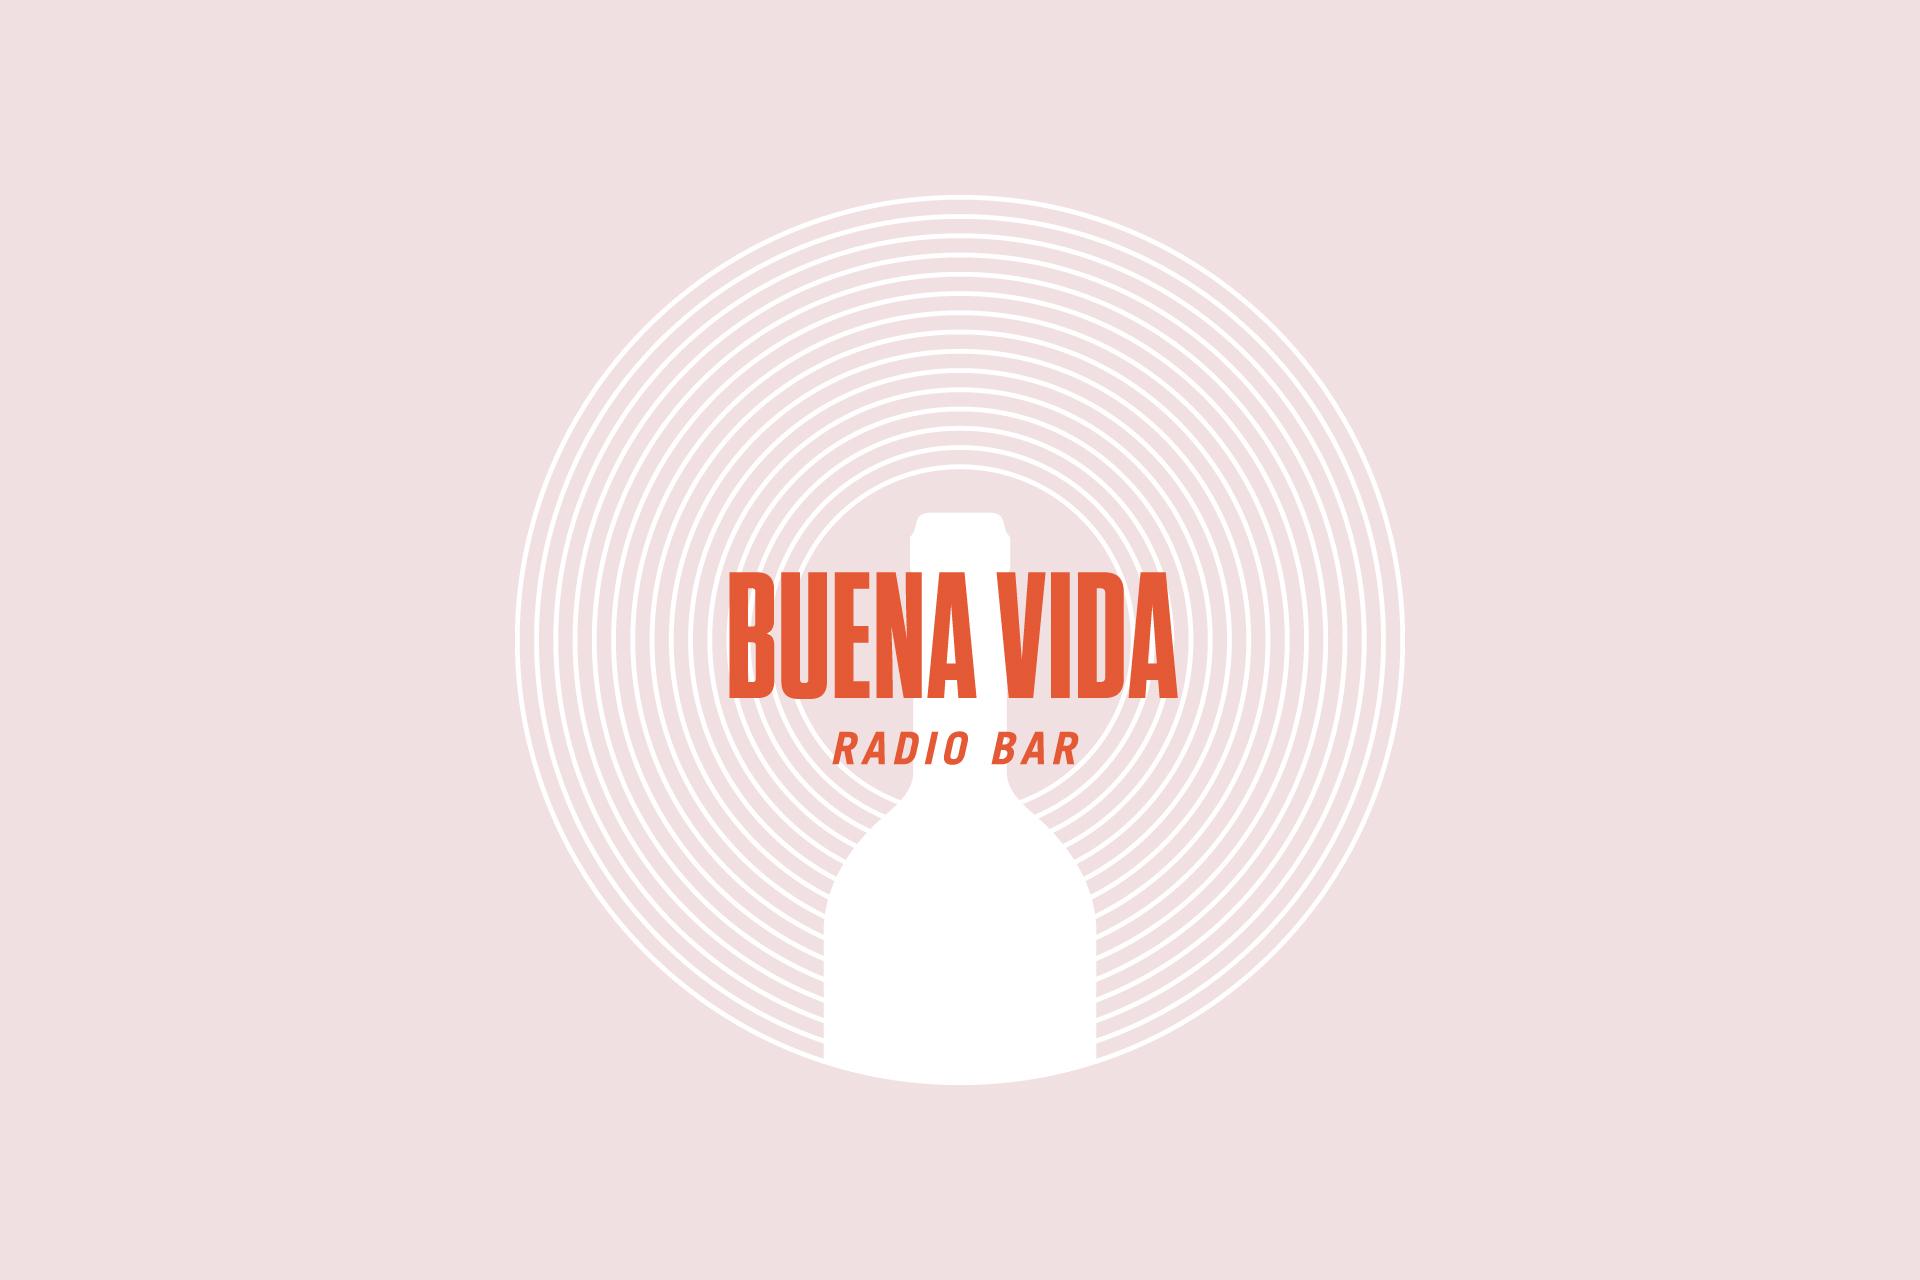 Buena Vida Branding